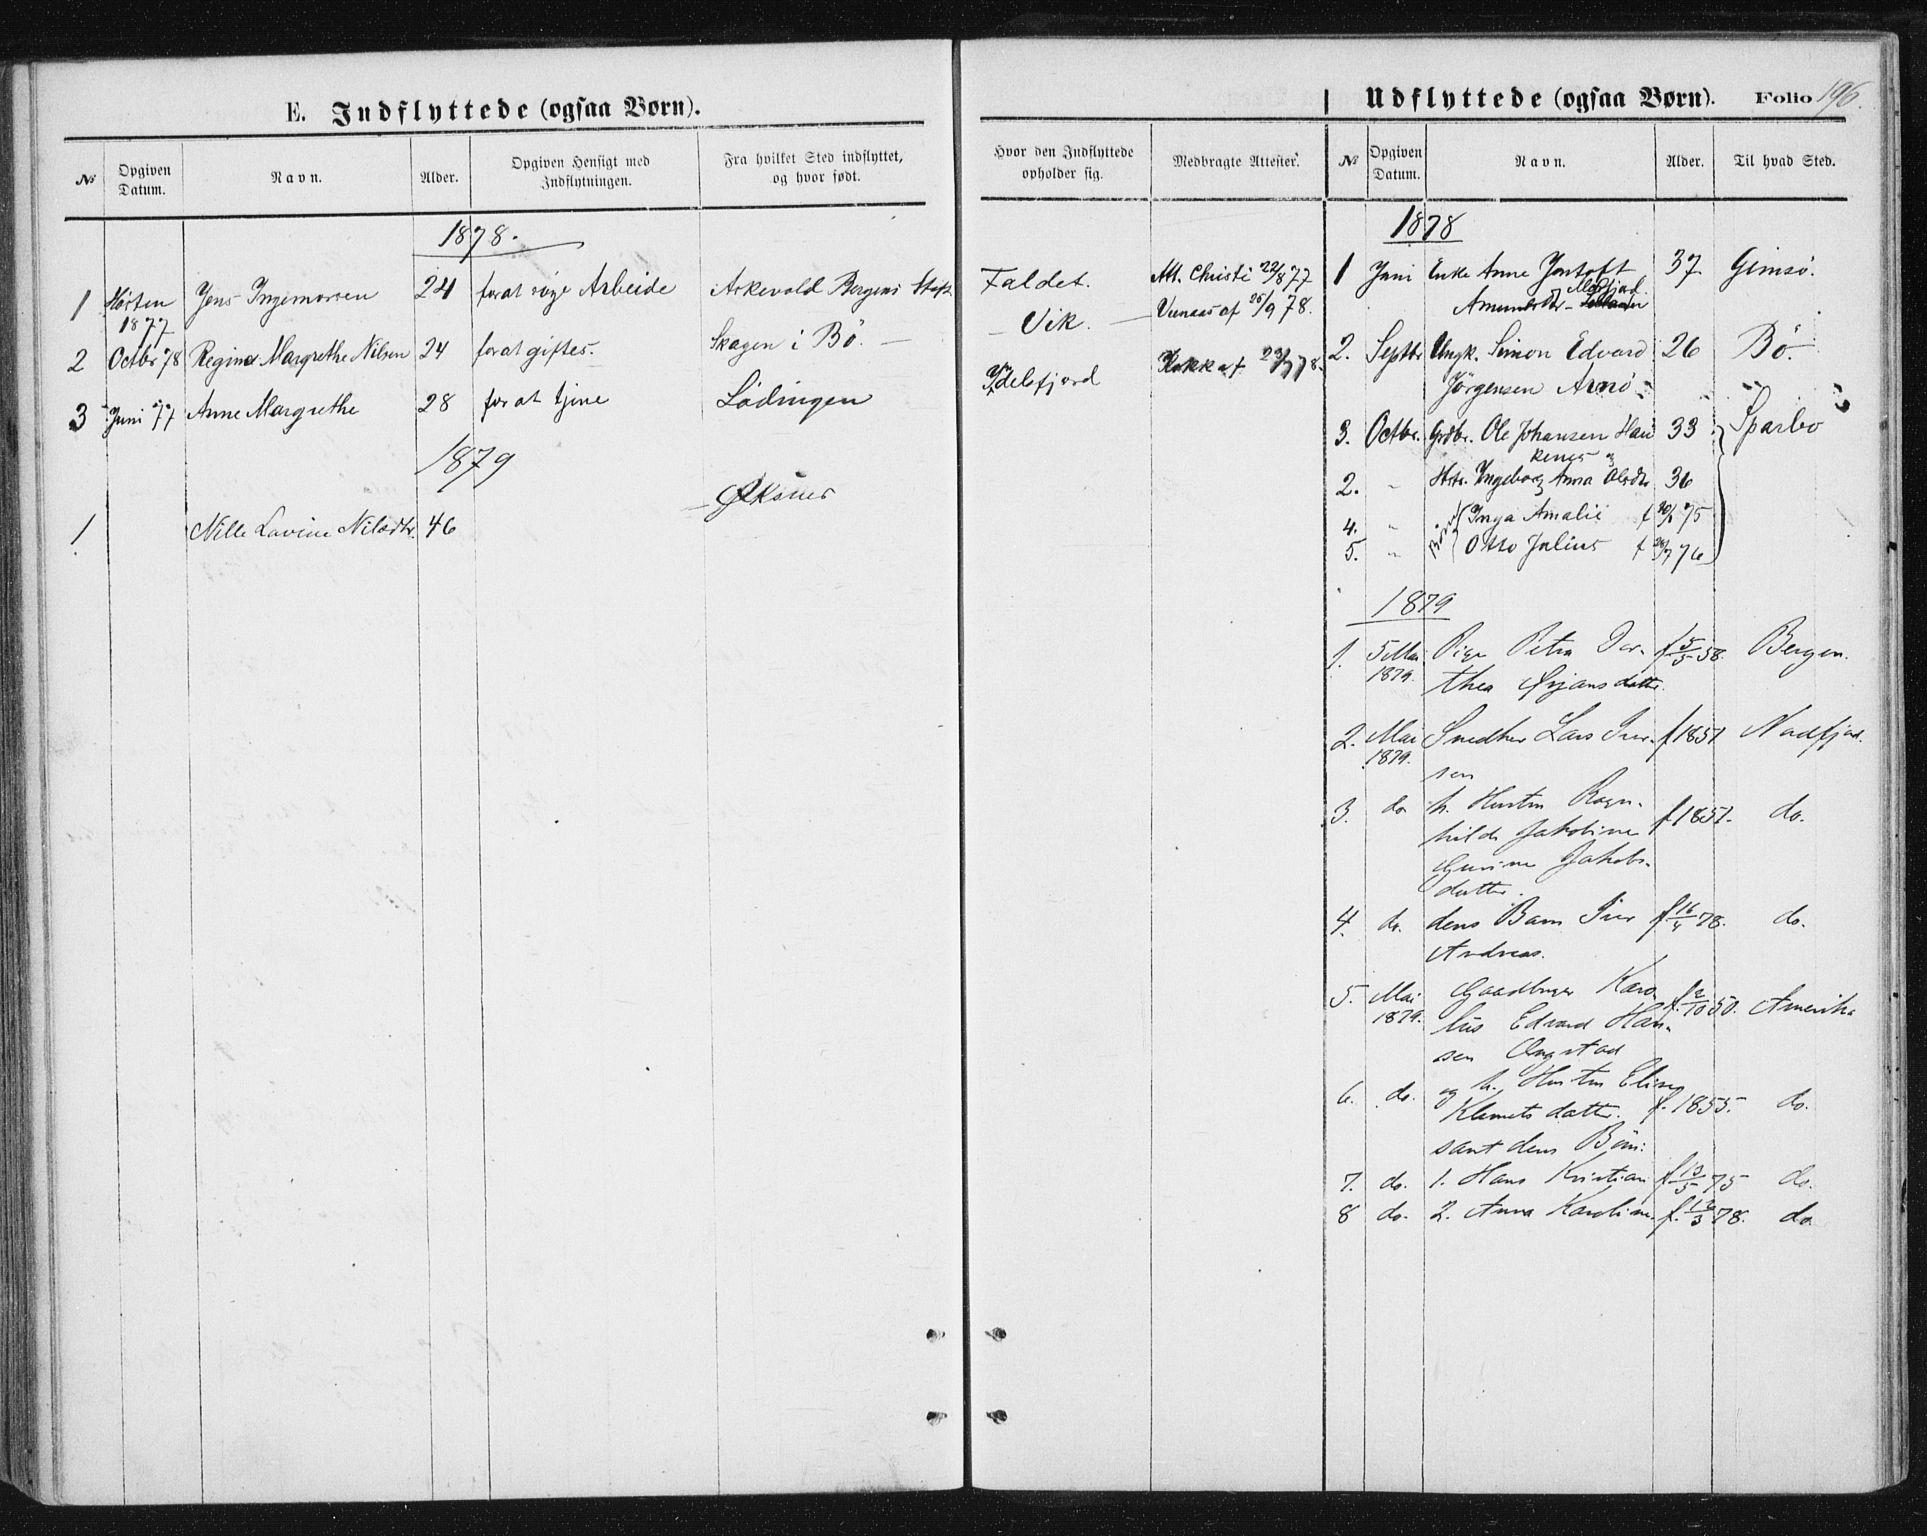 SAT, Ministerialprotokoller, klokkerbøker og fødselsregistre - Nordland, 888/L1243: Ministerialbok nr. 888A09, 1876-1879, s. 196